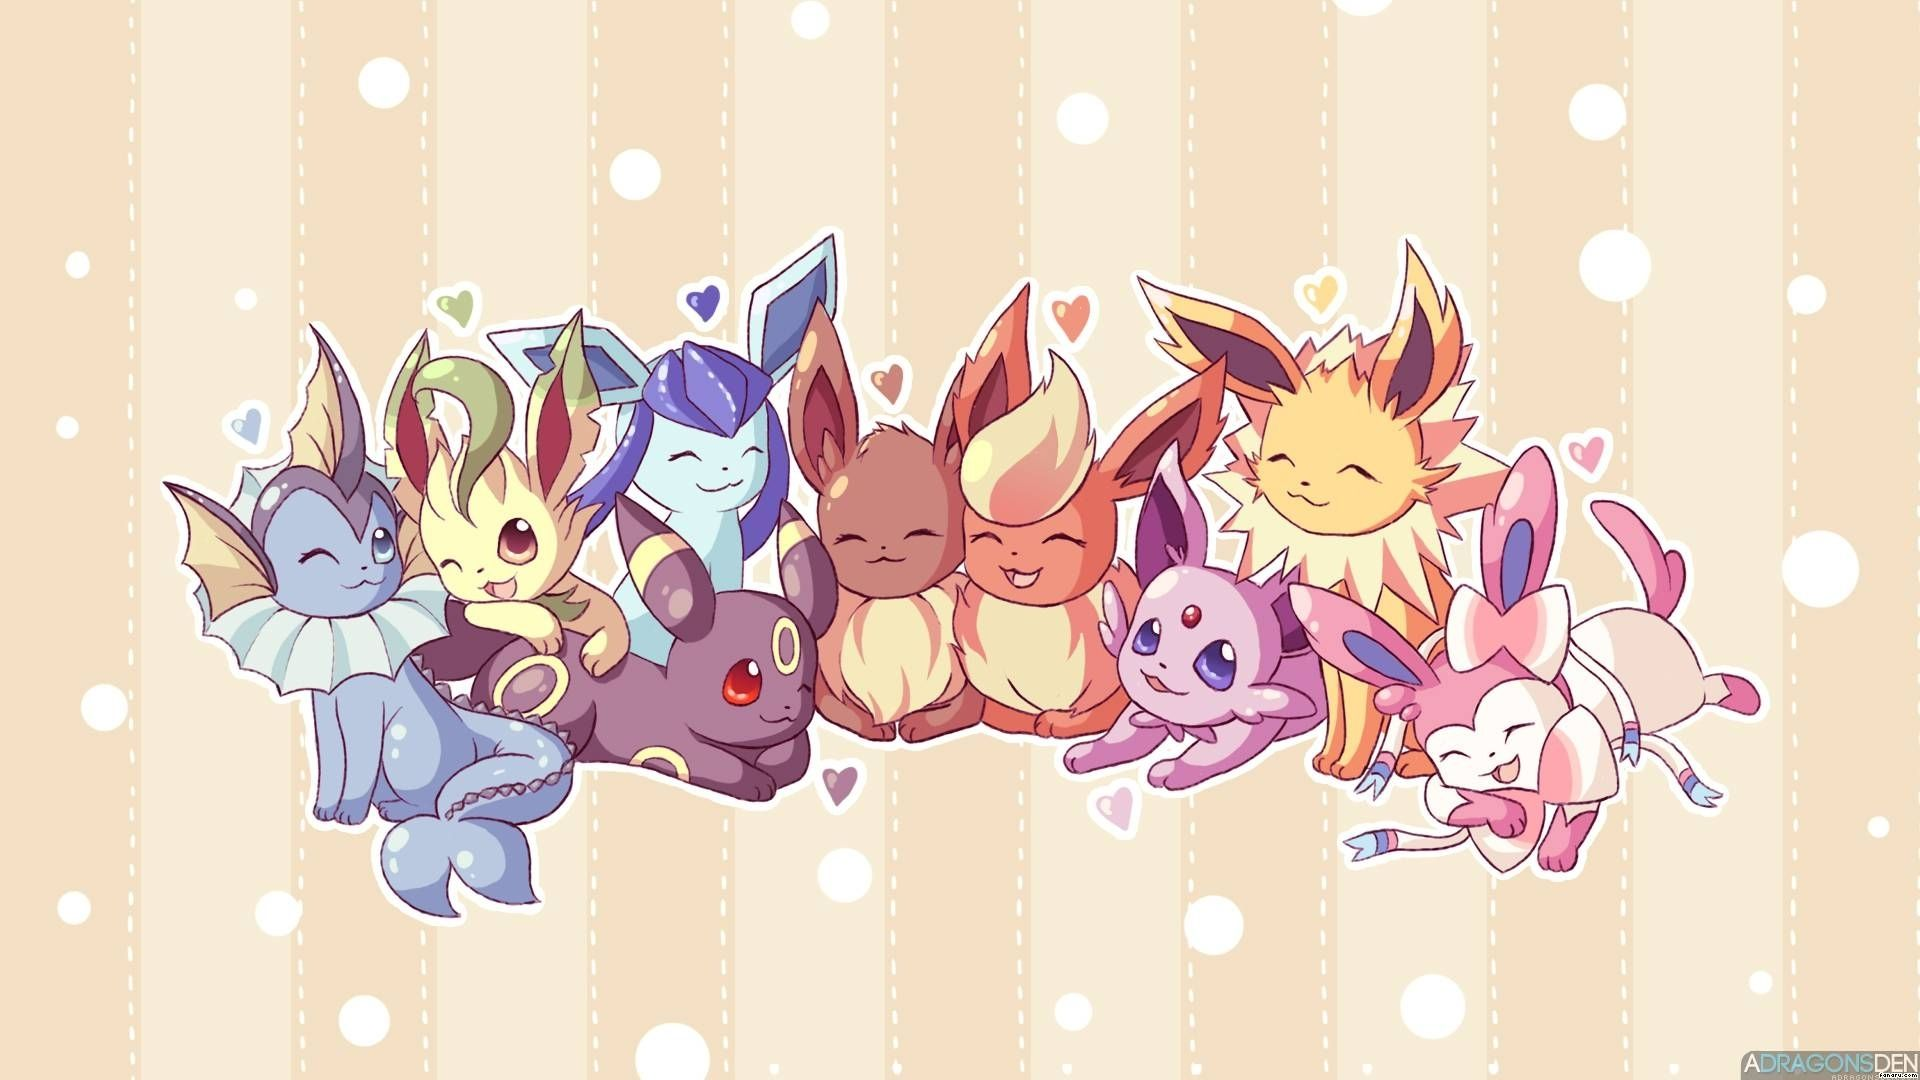 10 New Pokemon Eevee Evolution Wallpaper Full Hd 1080p For Pc Background Eevee Wallpaper Cute Pokemon Wallpaper Pokemon Eevee Evolutions